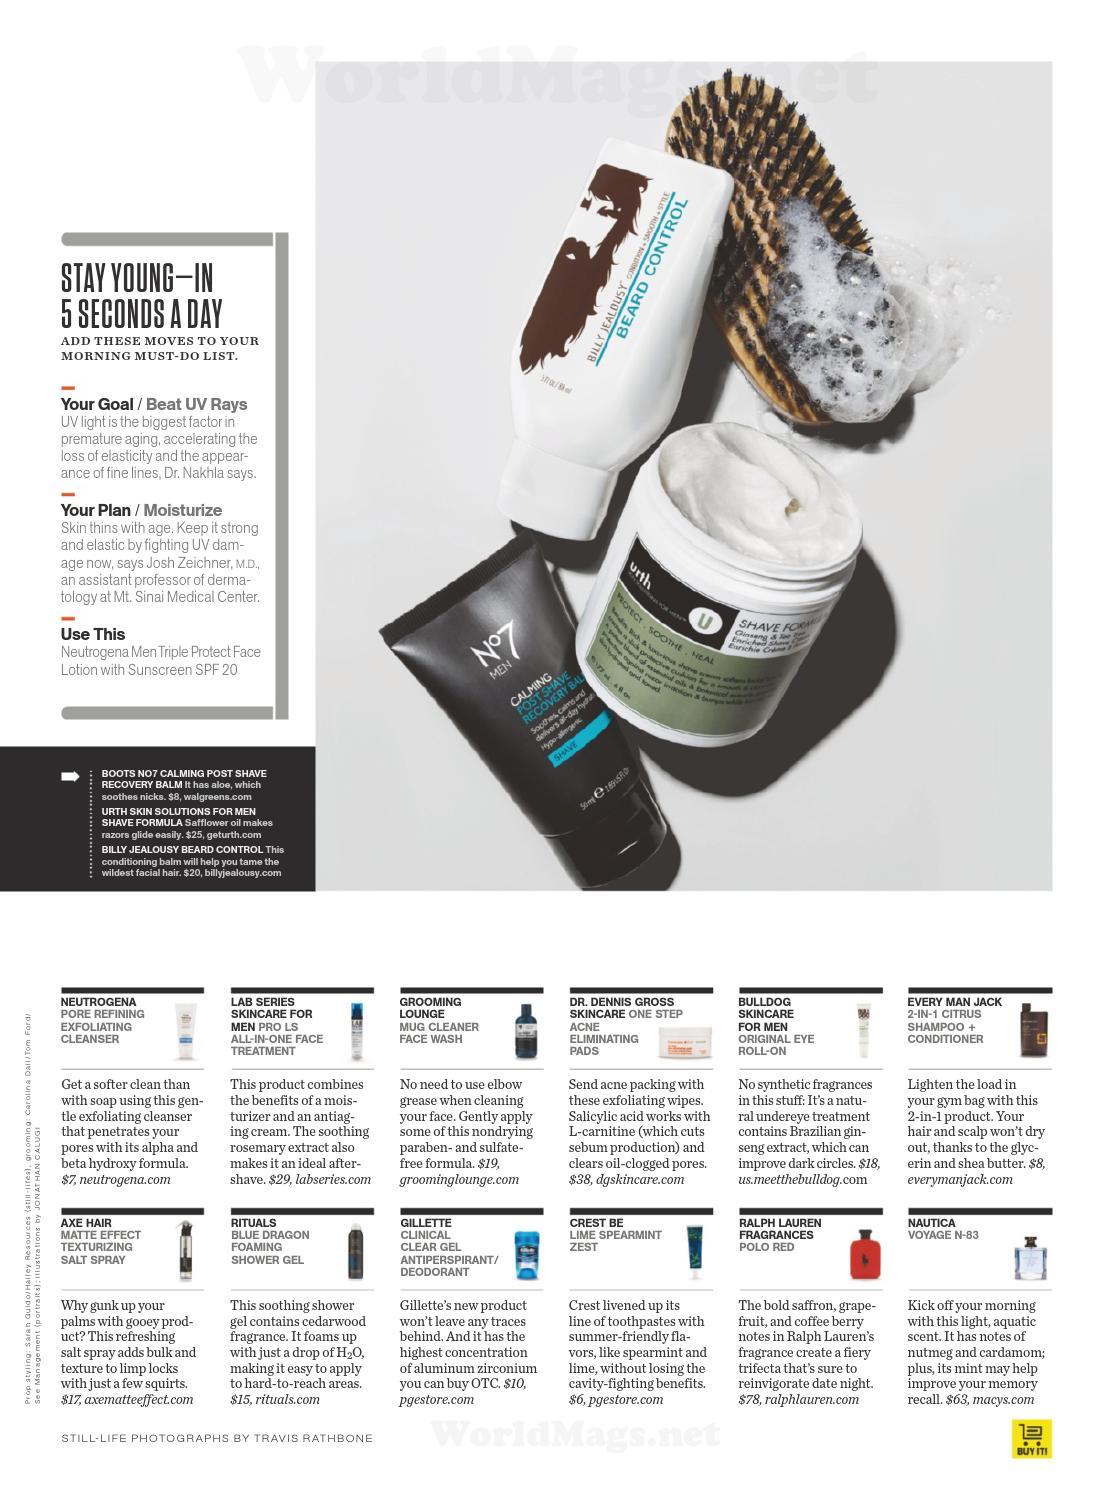 Mens health usa 2014 06 by Turii - issuu